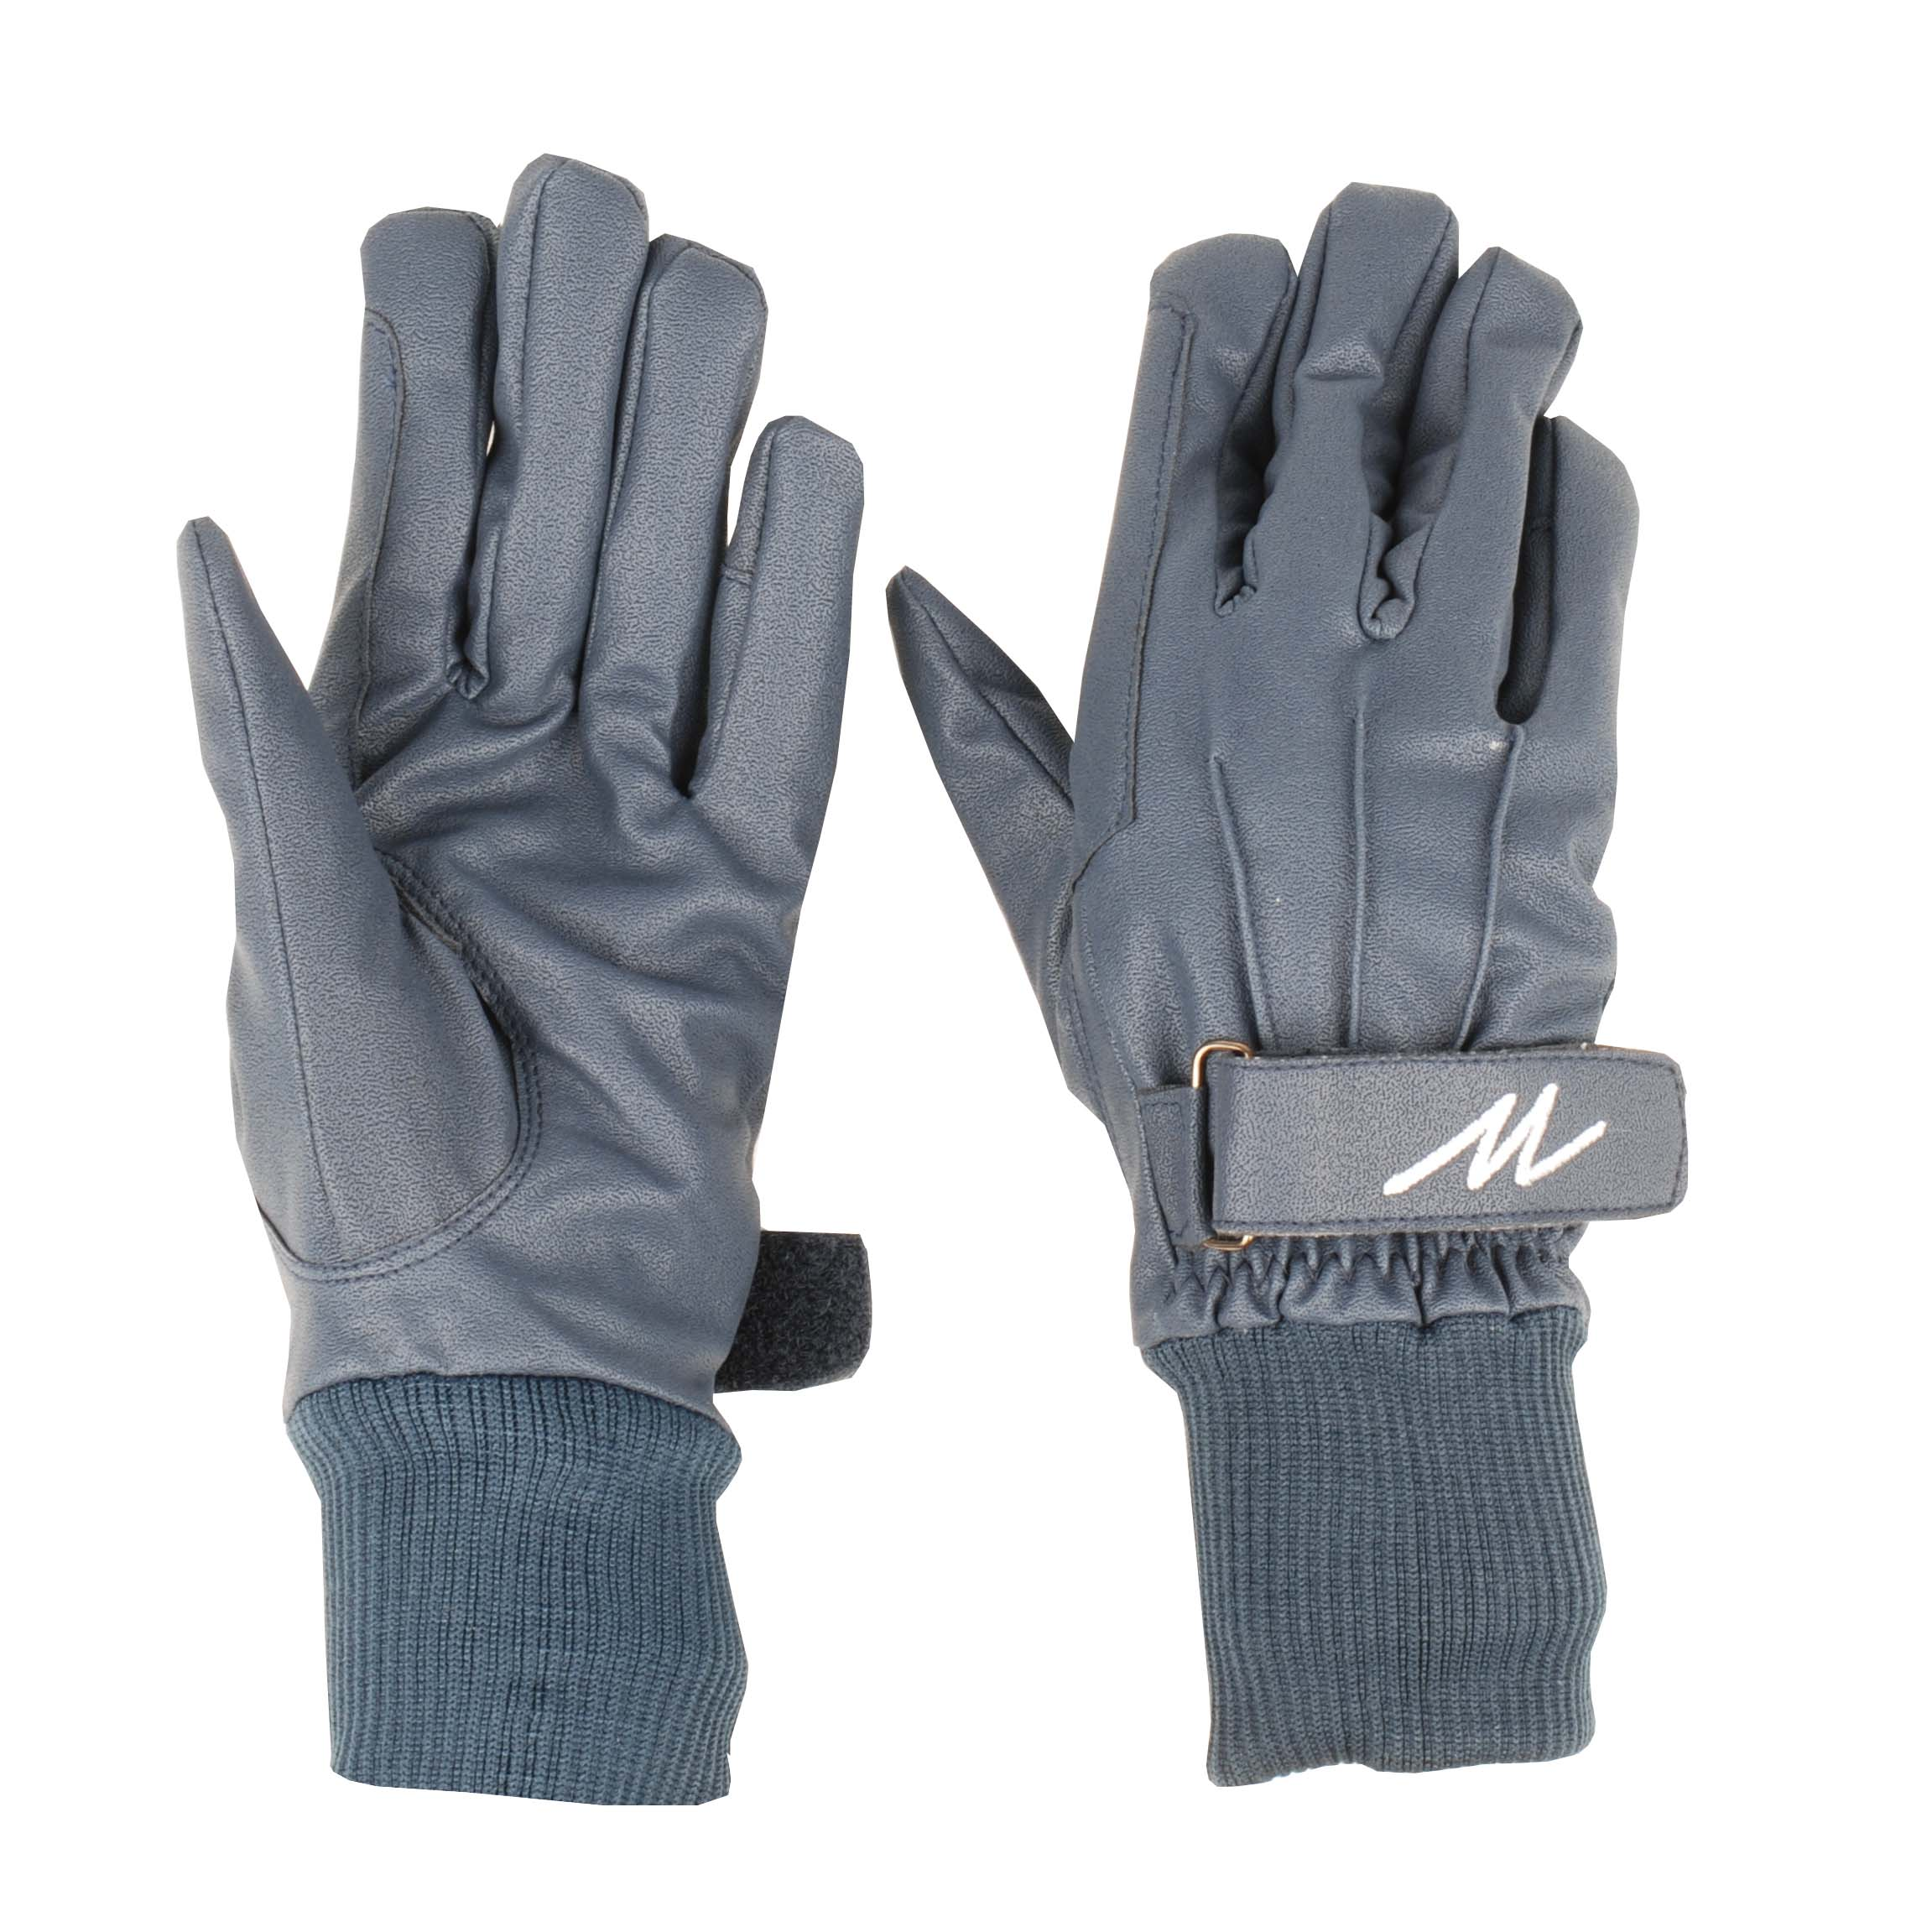 Mondoni Cordoba handschoenen donkerblauw maat:xs